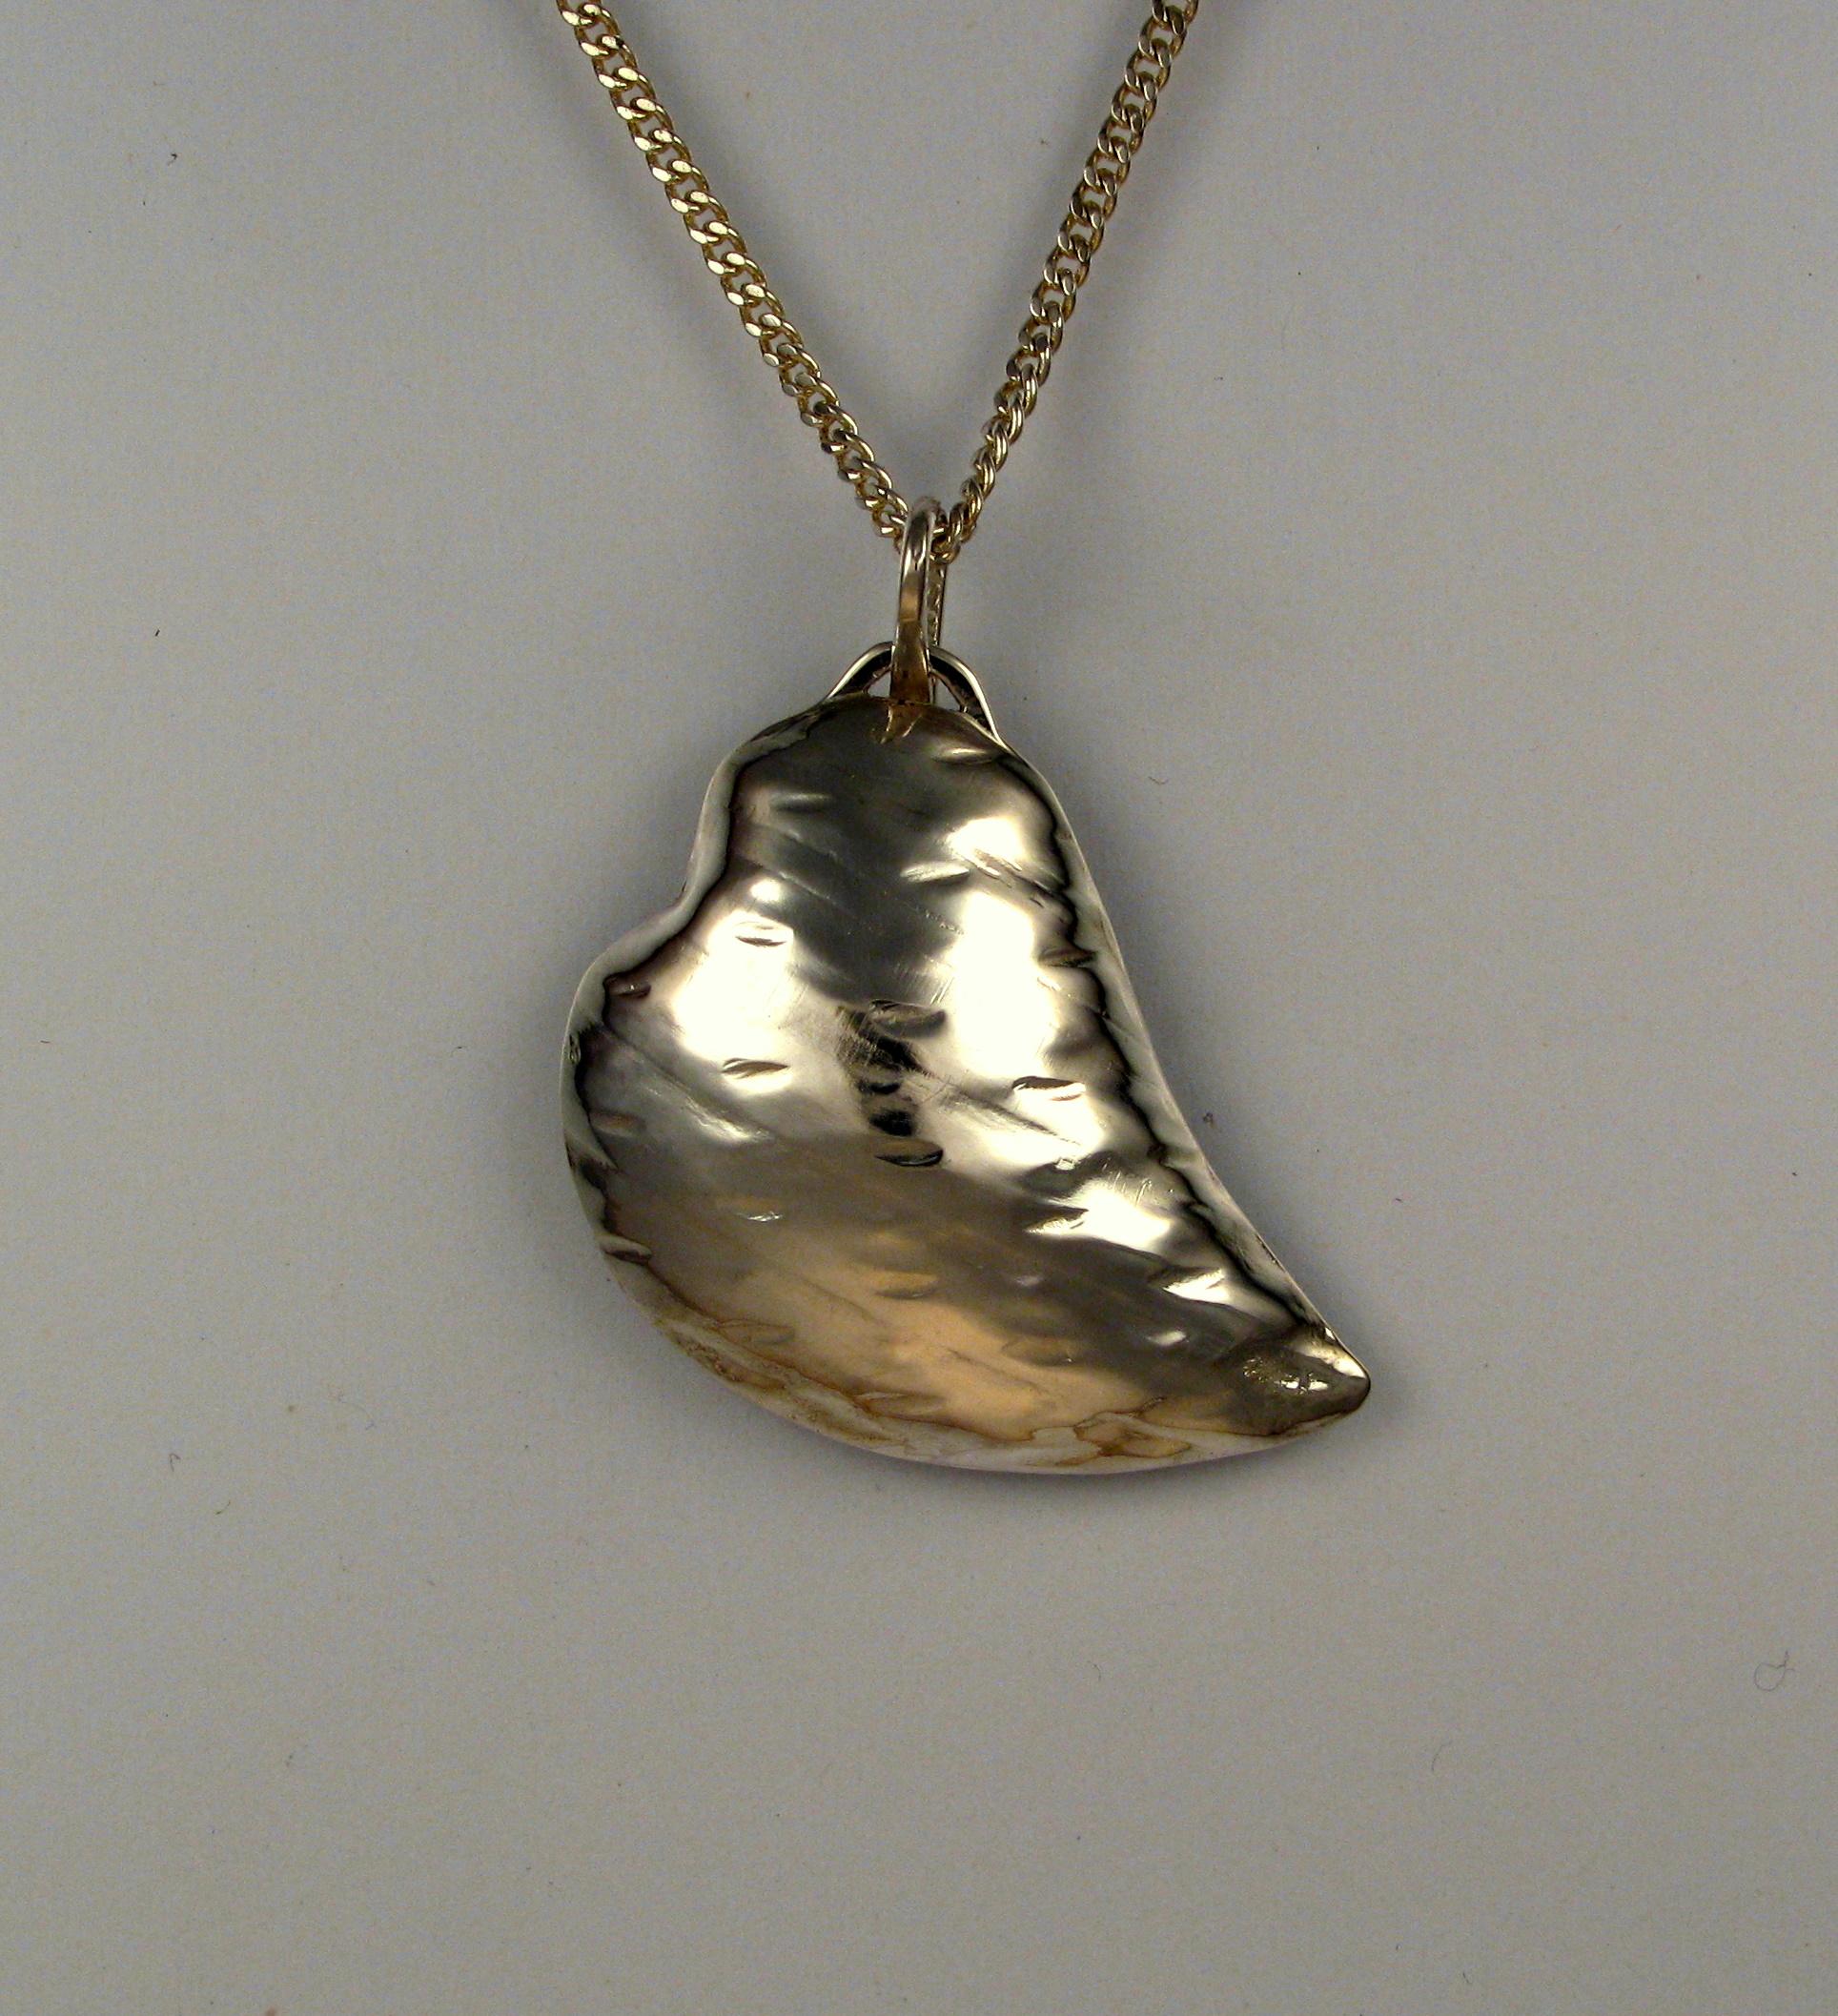 'Cushion' Heart Necklace